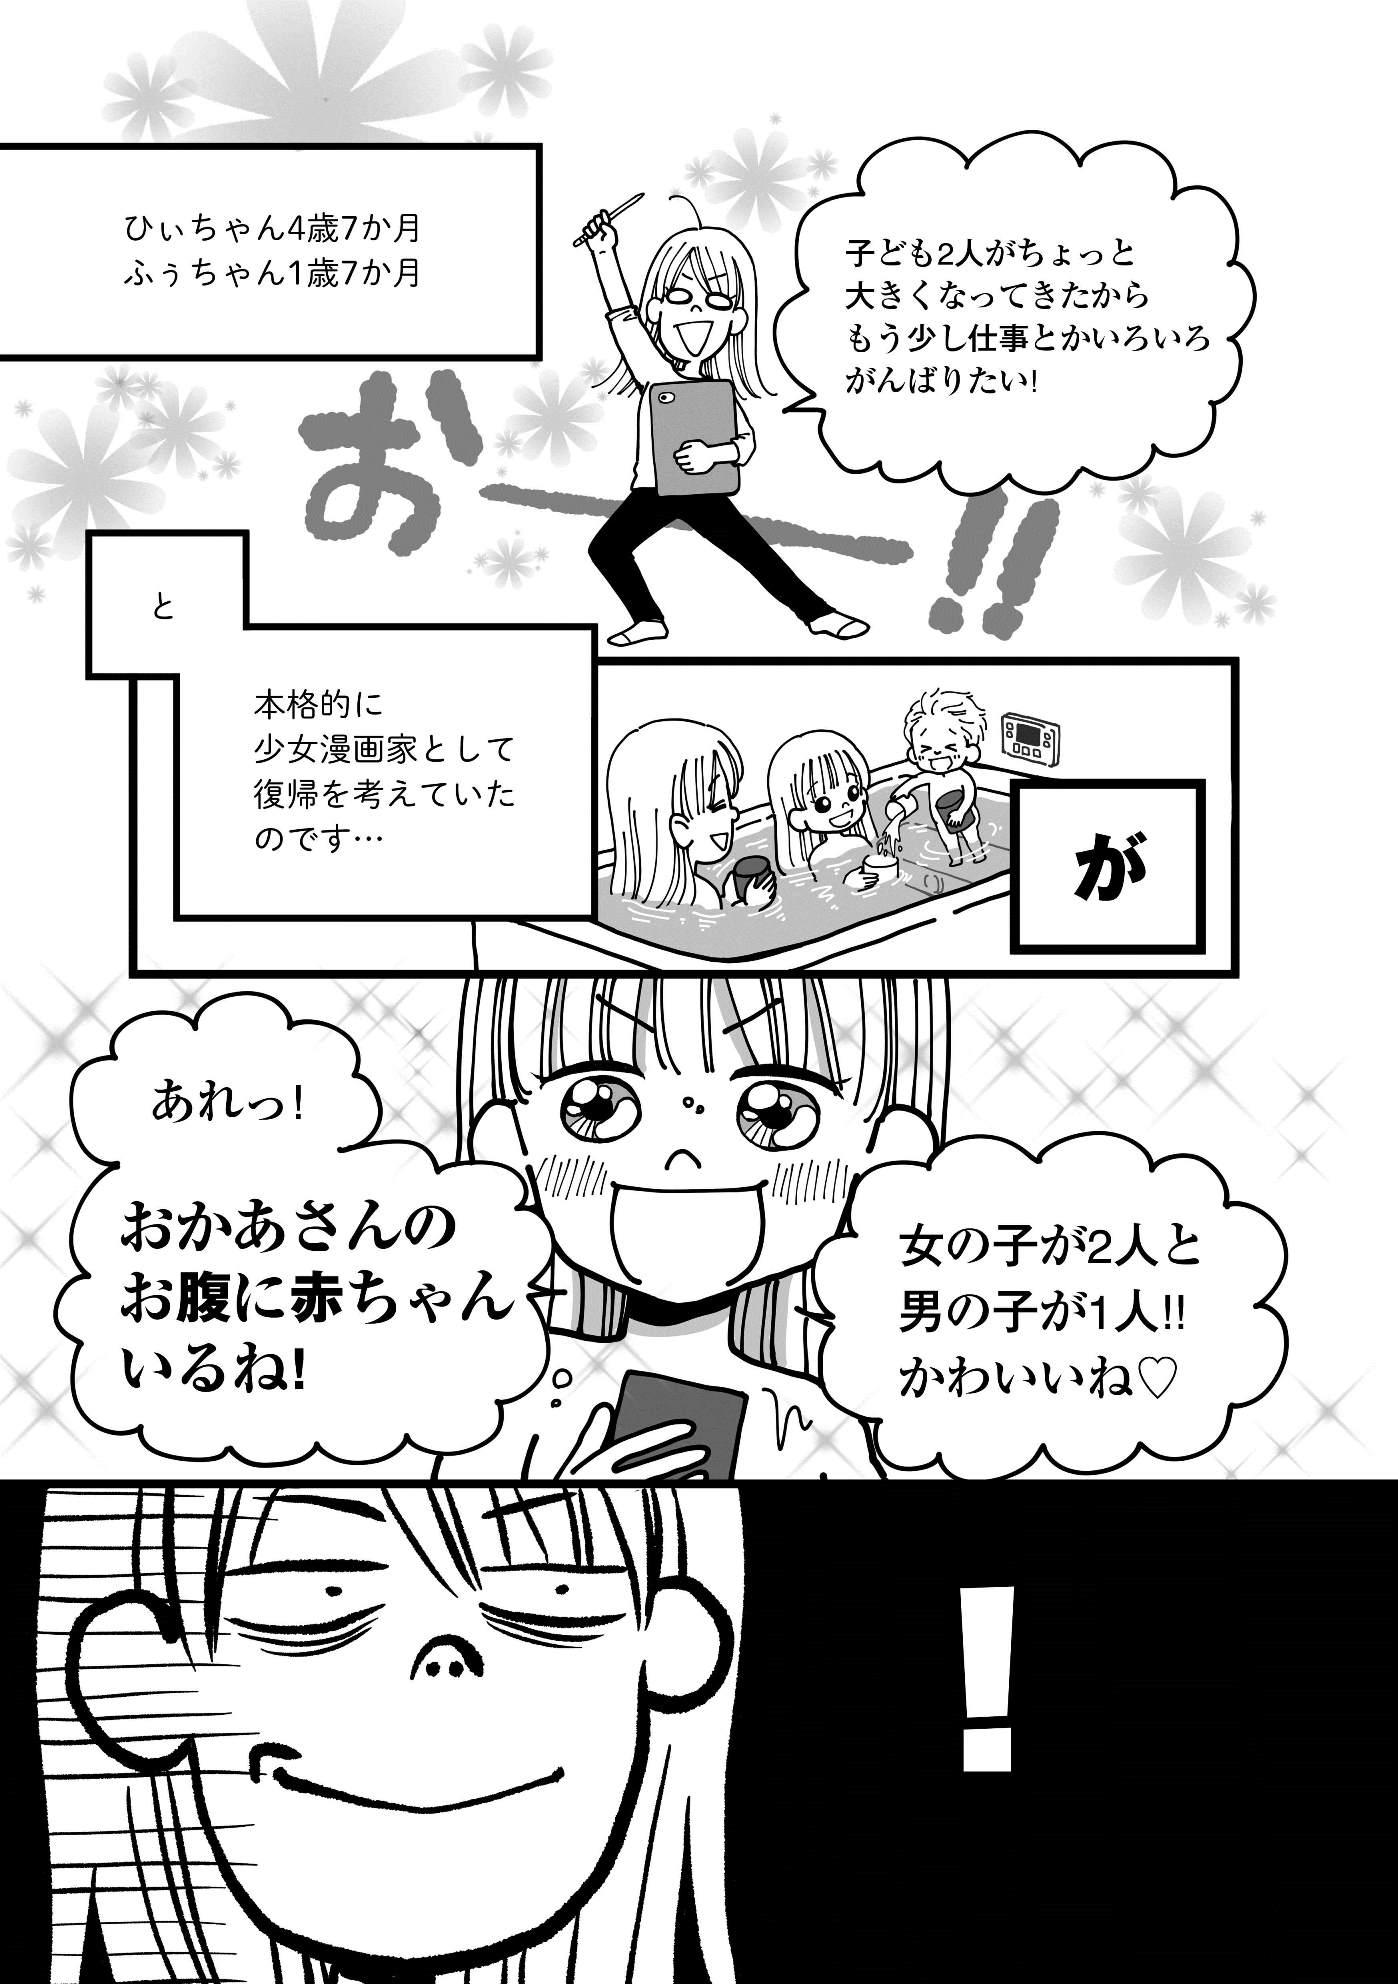 20200720osoranohanashi_sub2.jpg